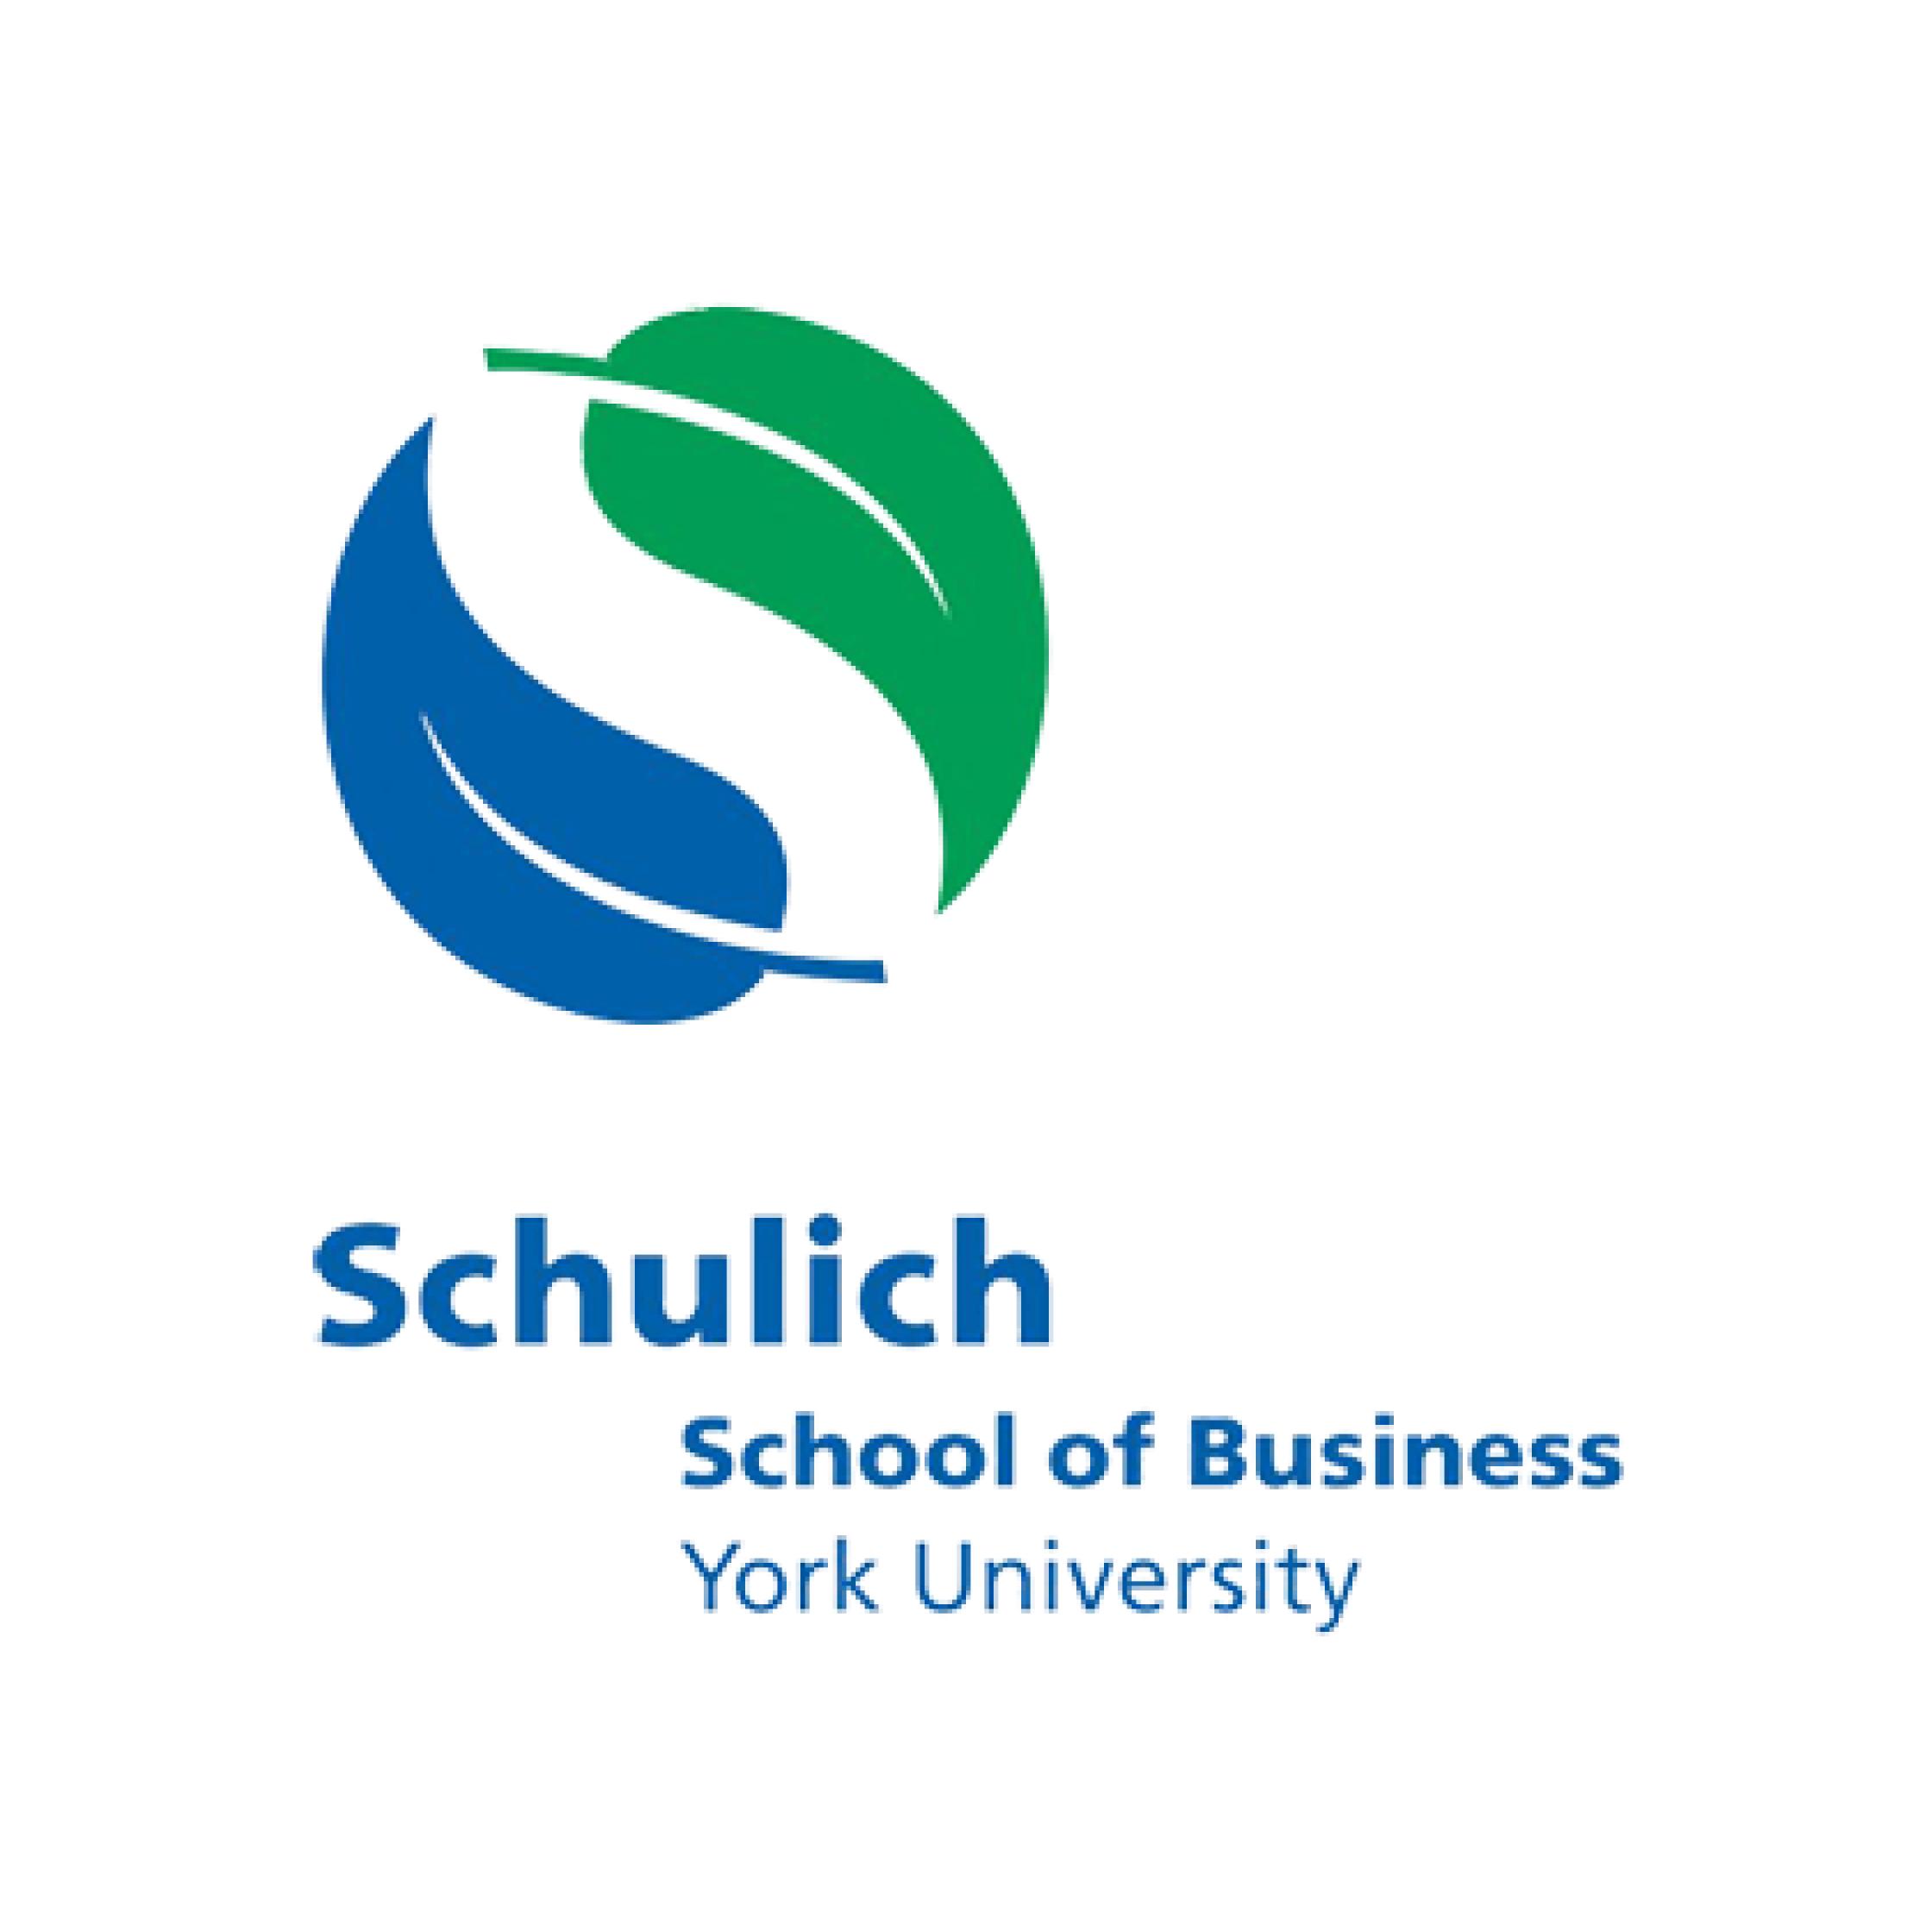 Schulich School of Business at York University logo